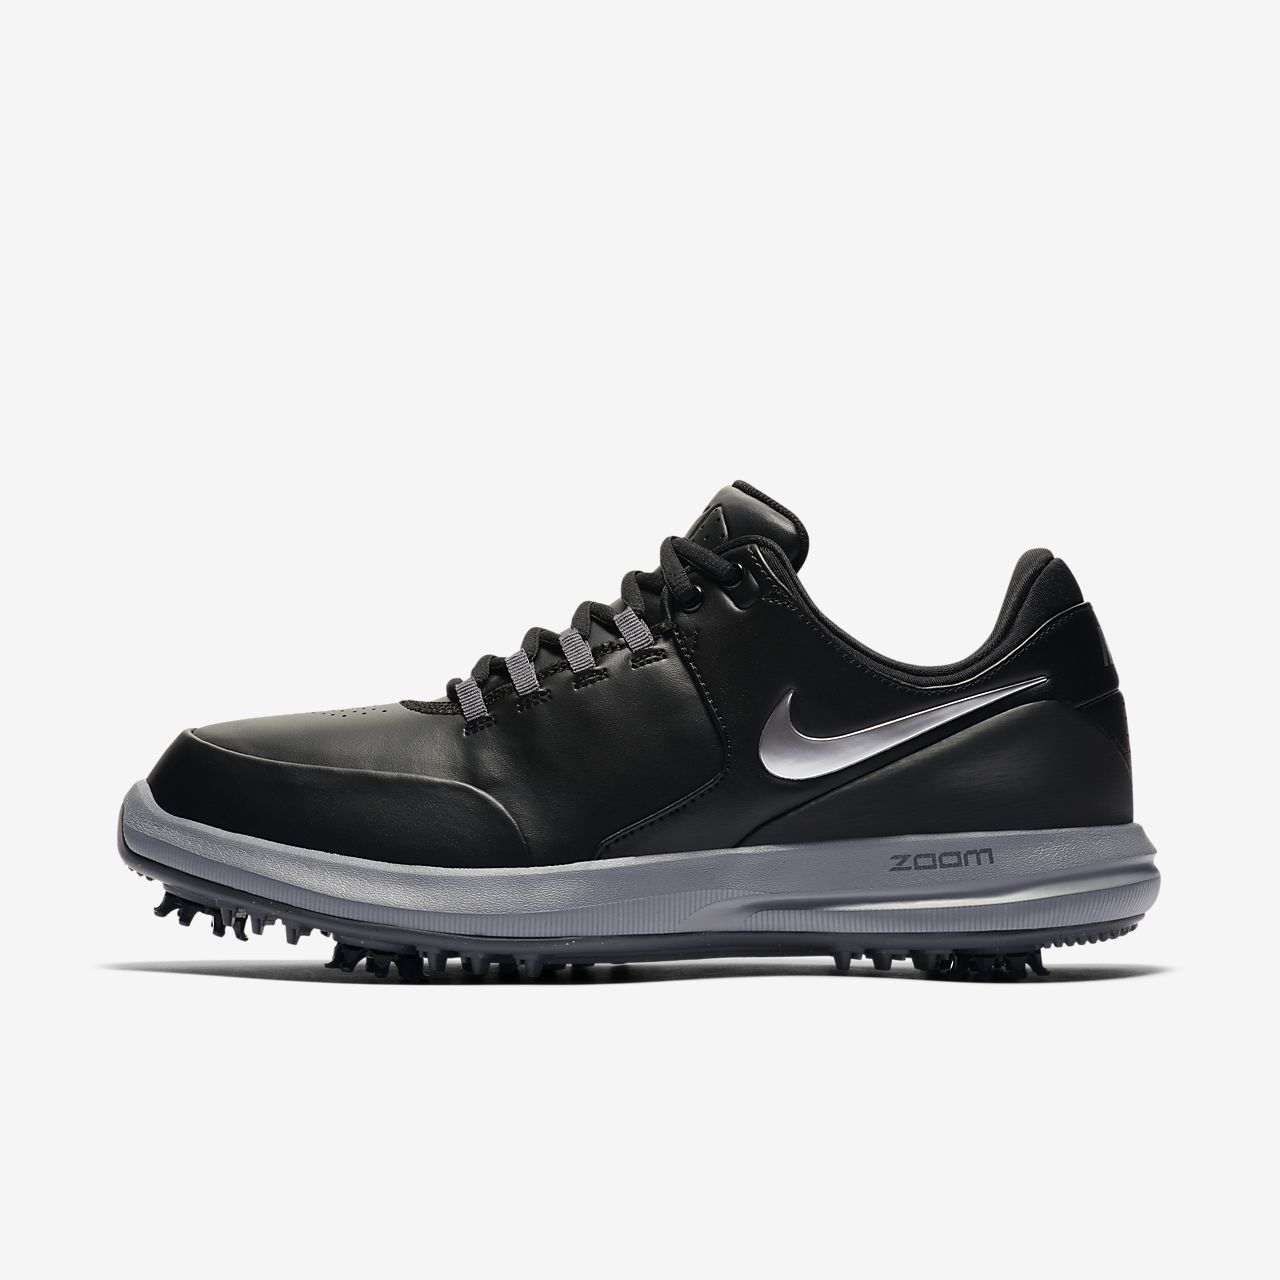 sneakers for cheap f988b 2c69a Calzado de golf para hombre Nike Air Zoom Accurate